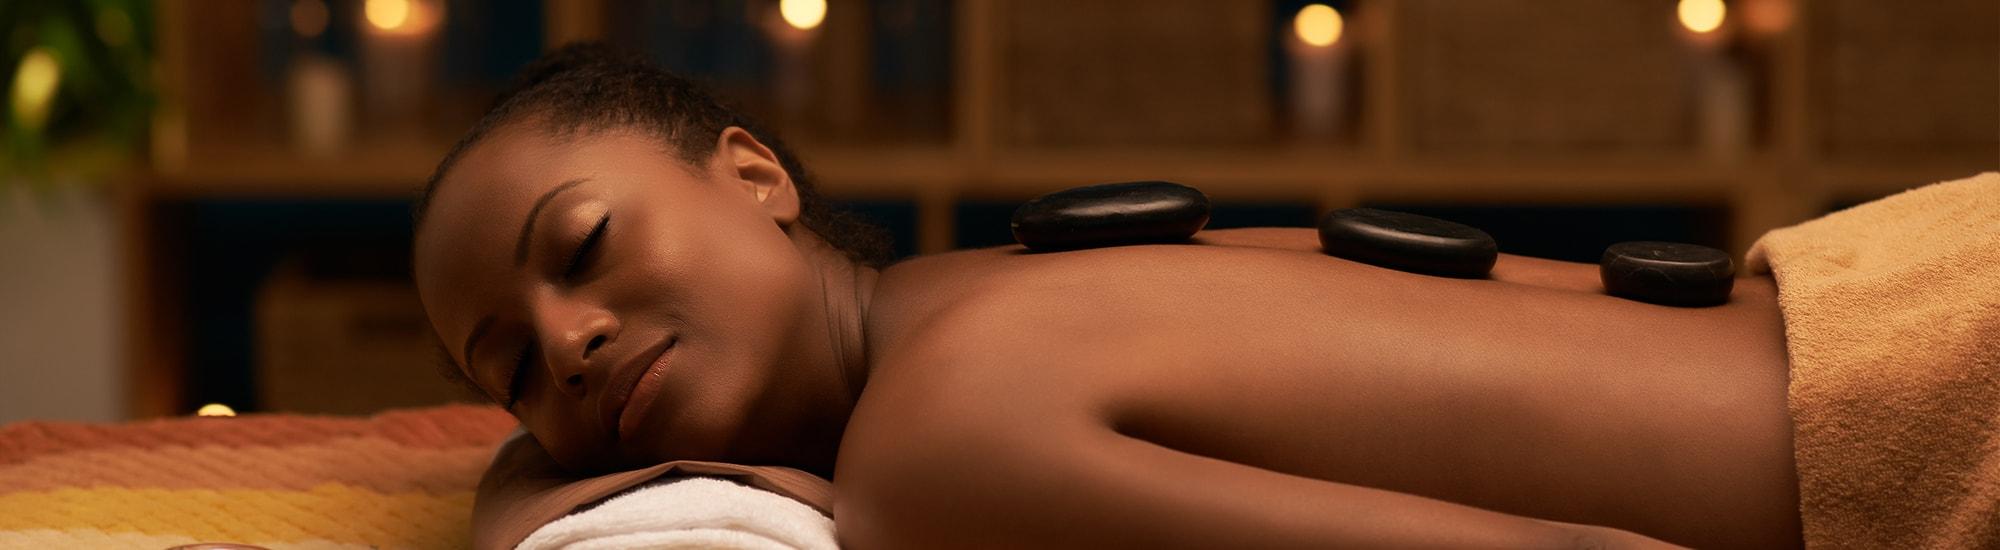 10 Incredible Benefits of Reflexology Massage